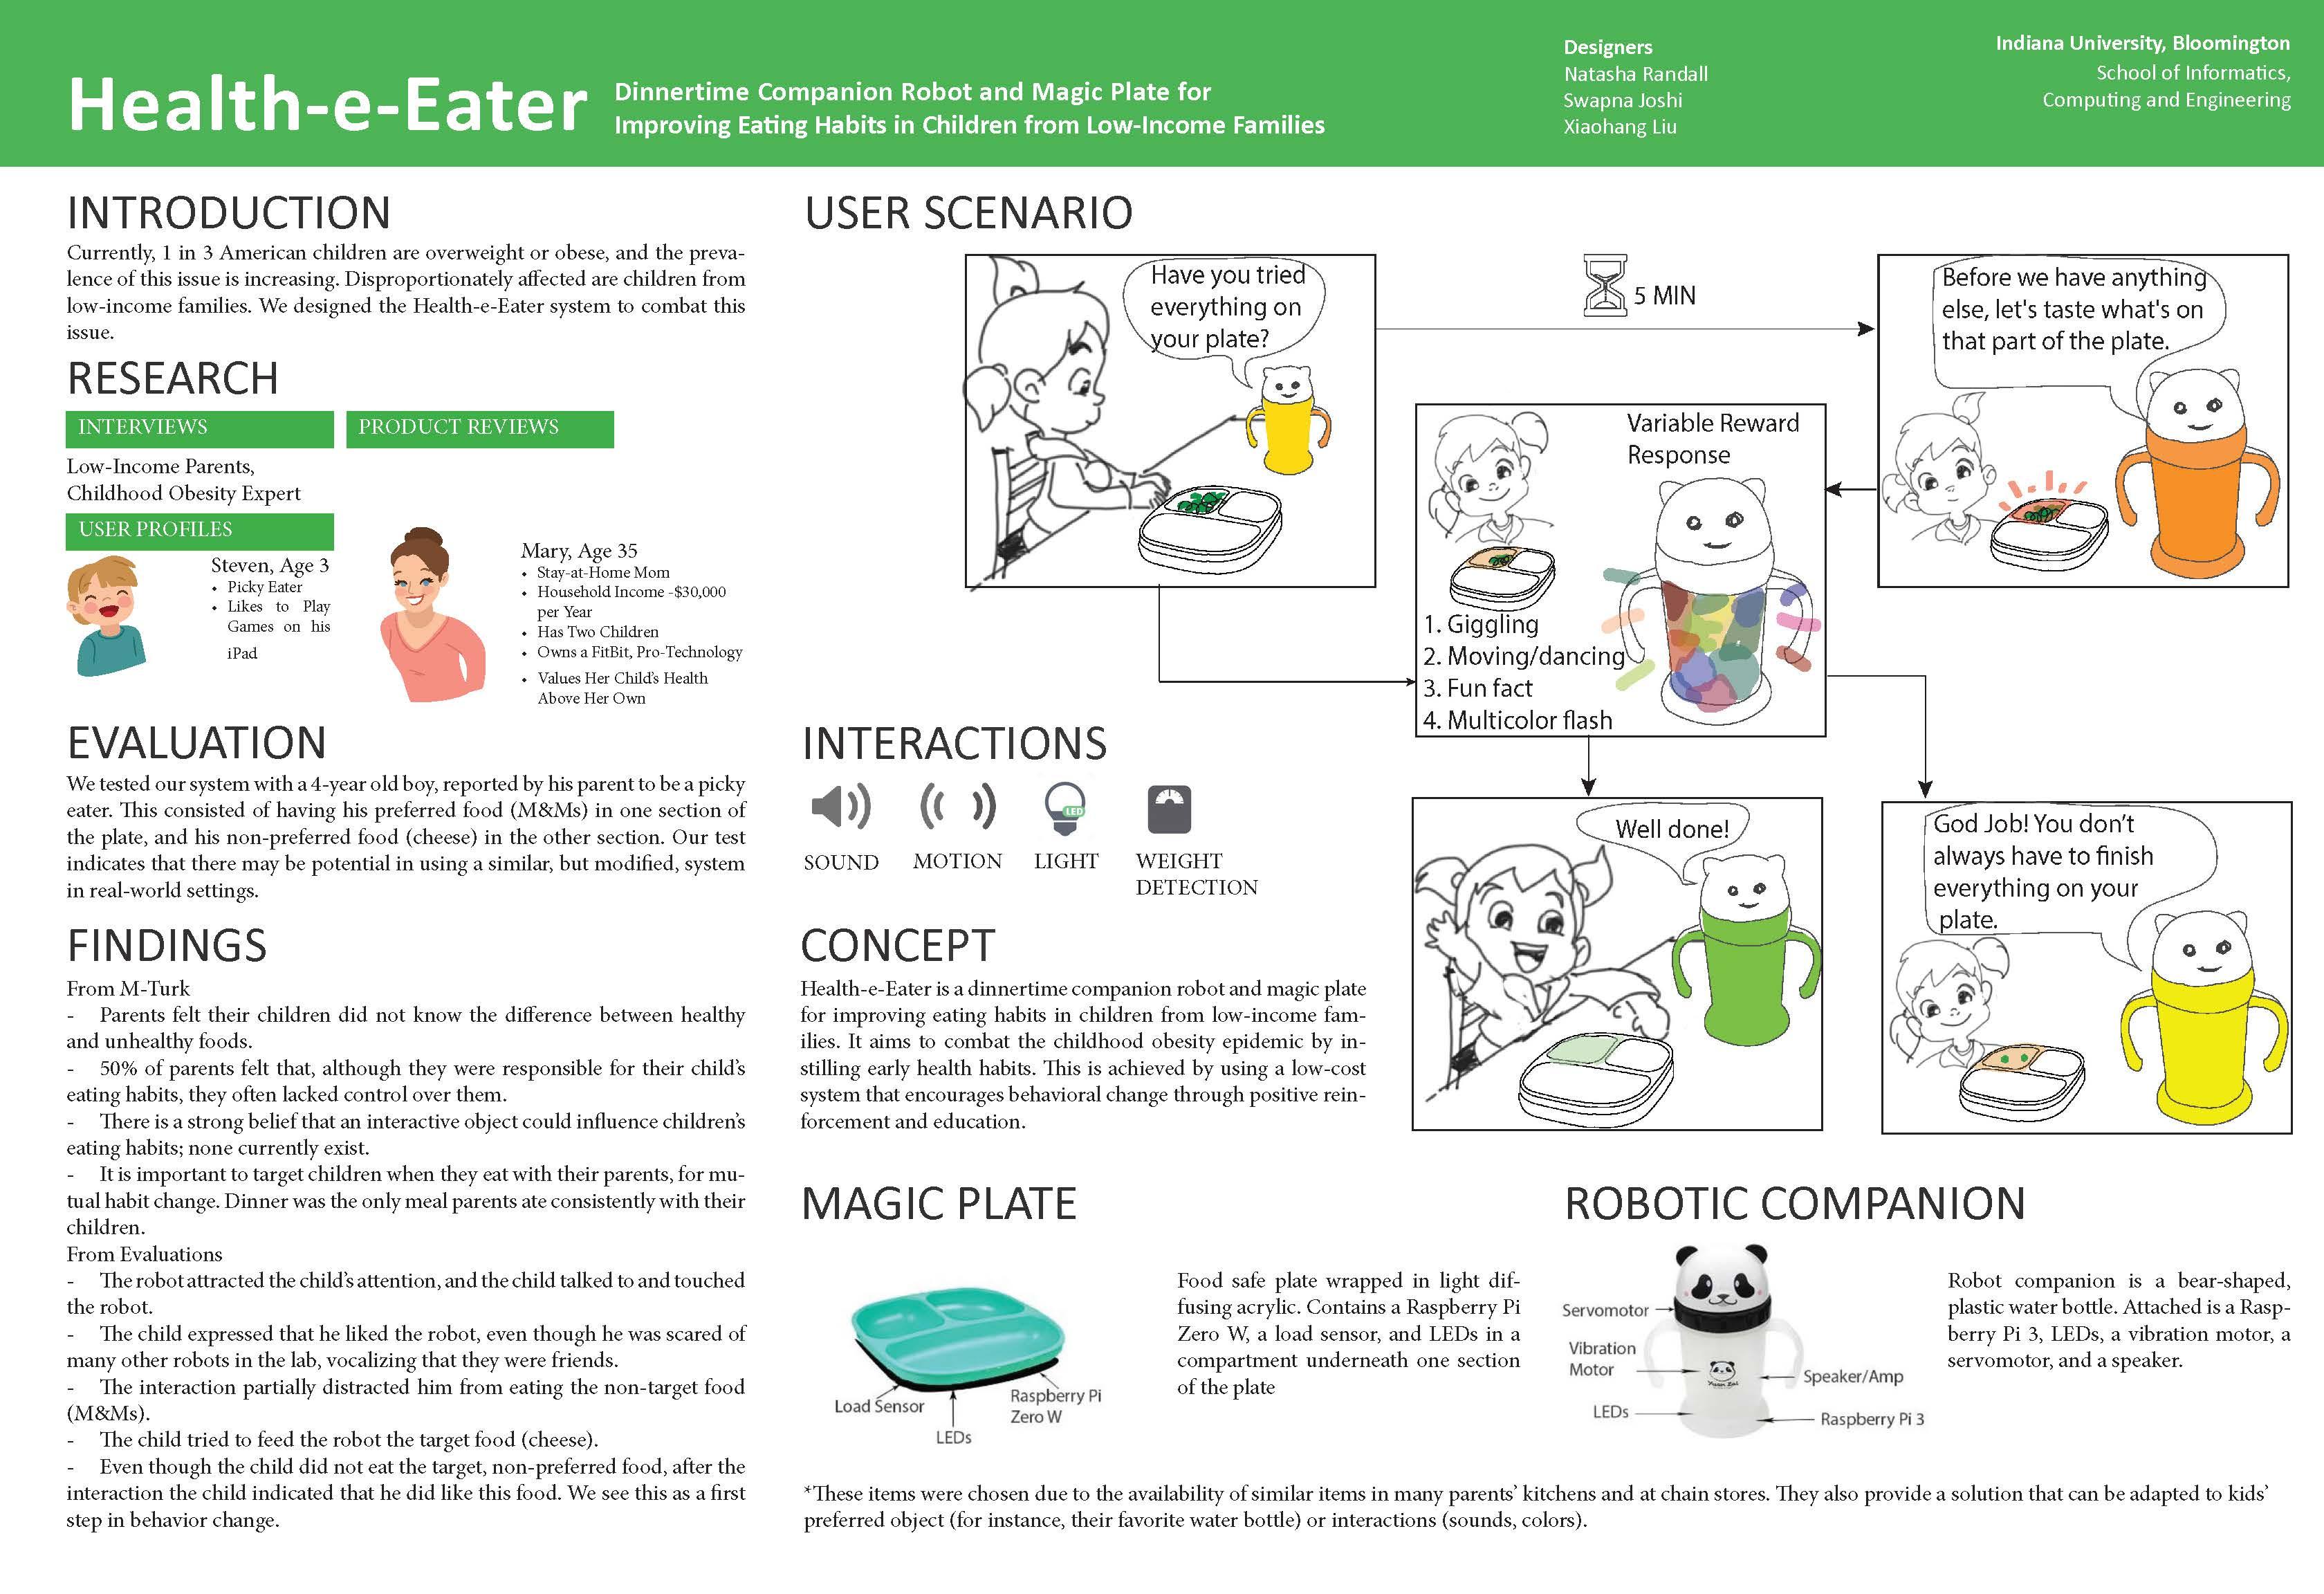 Health-e-eater